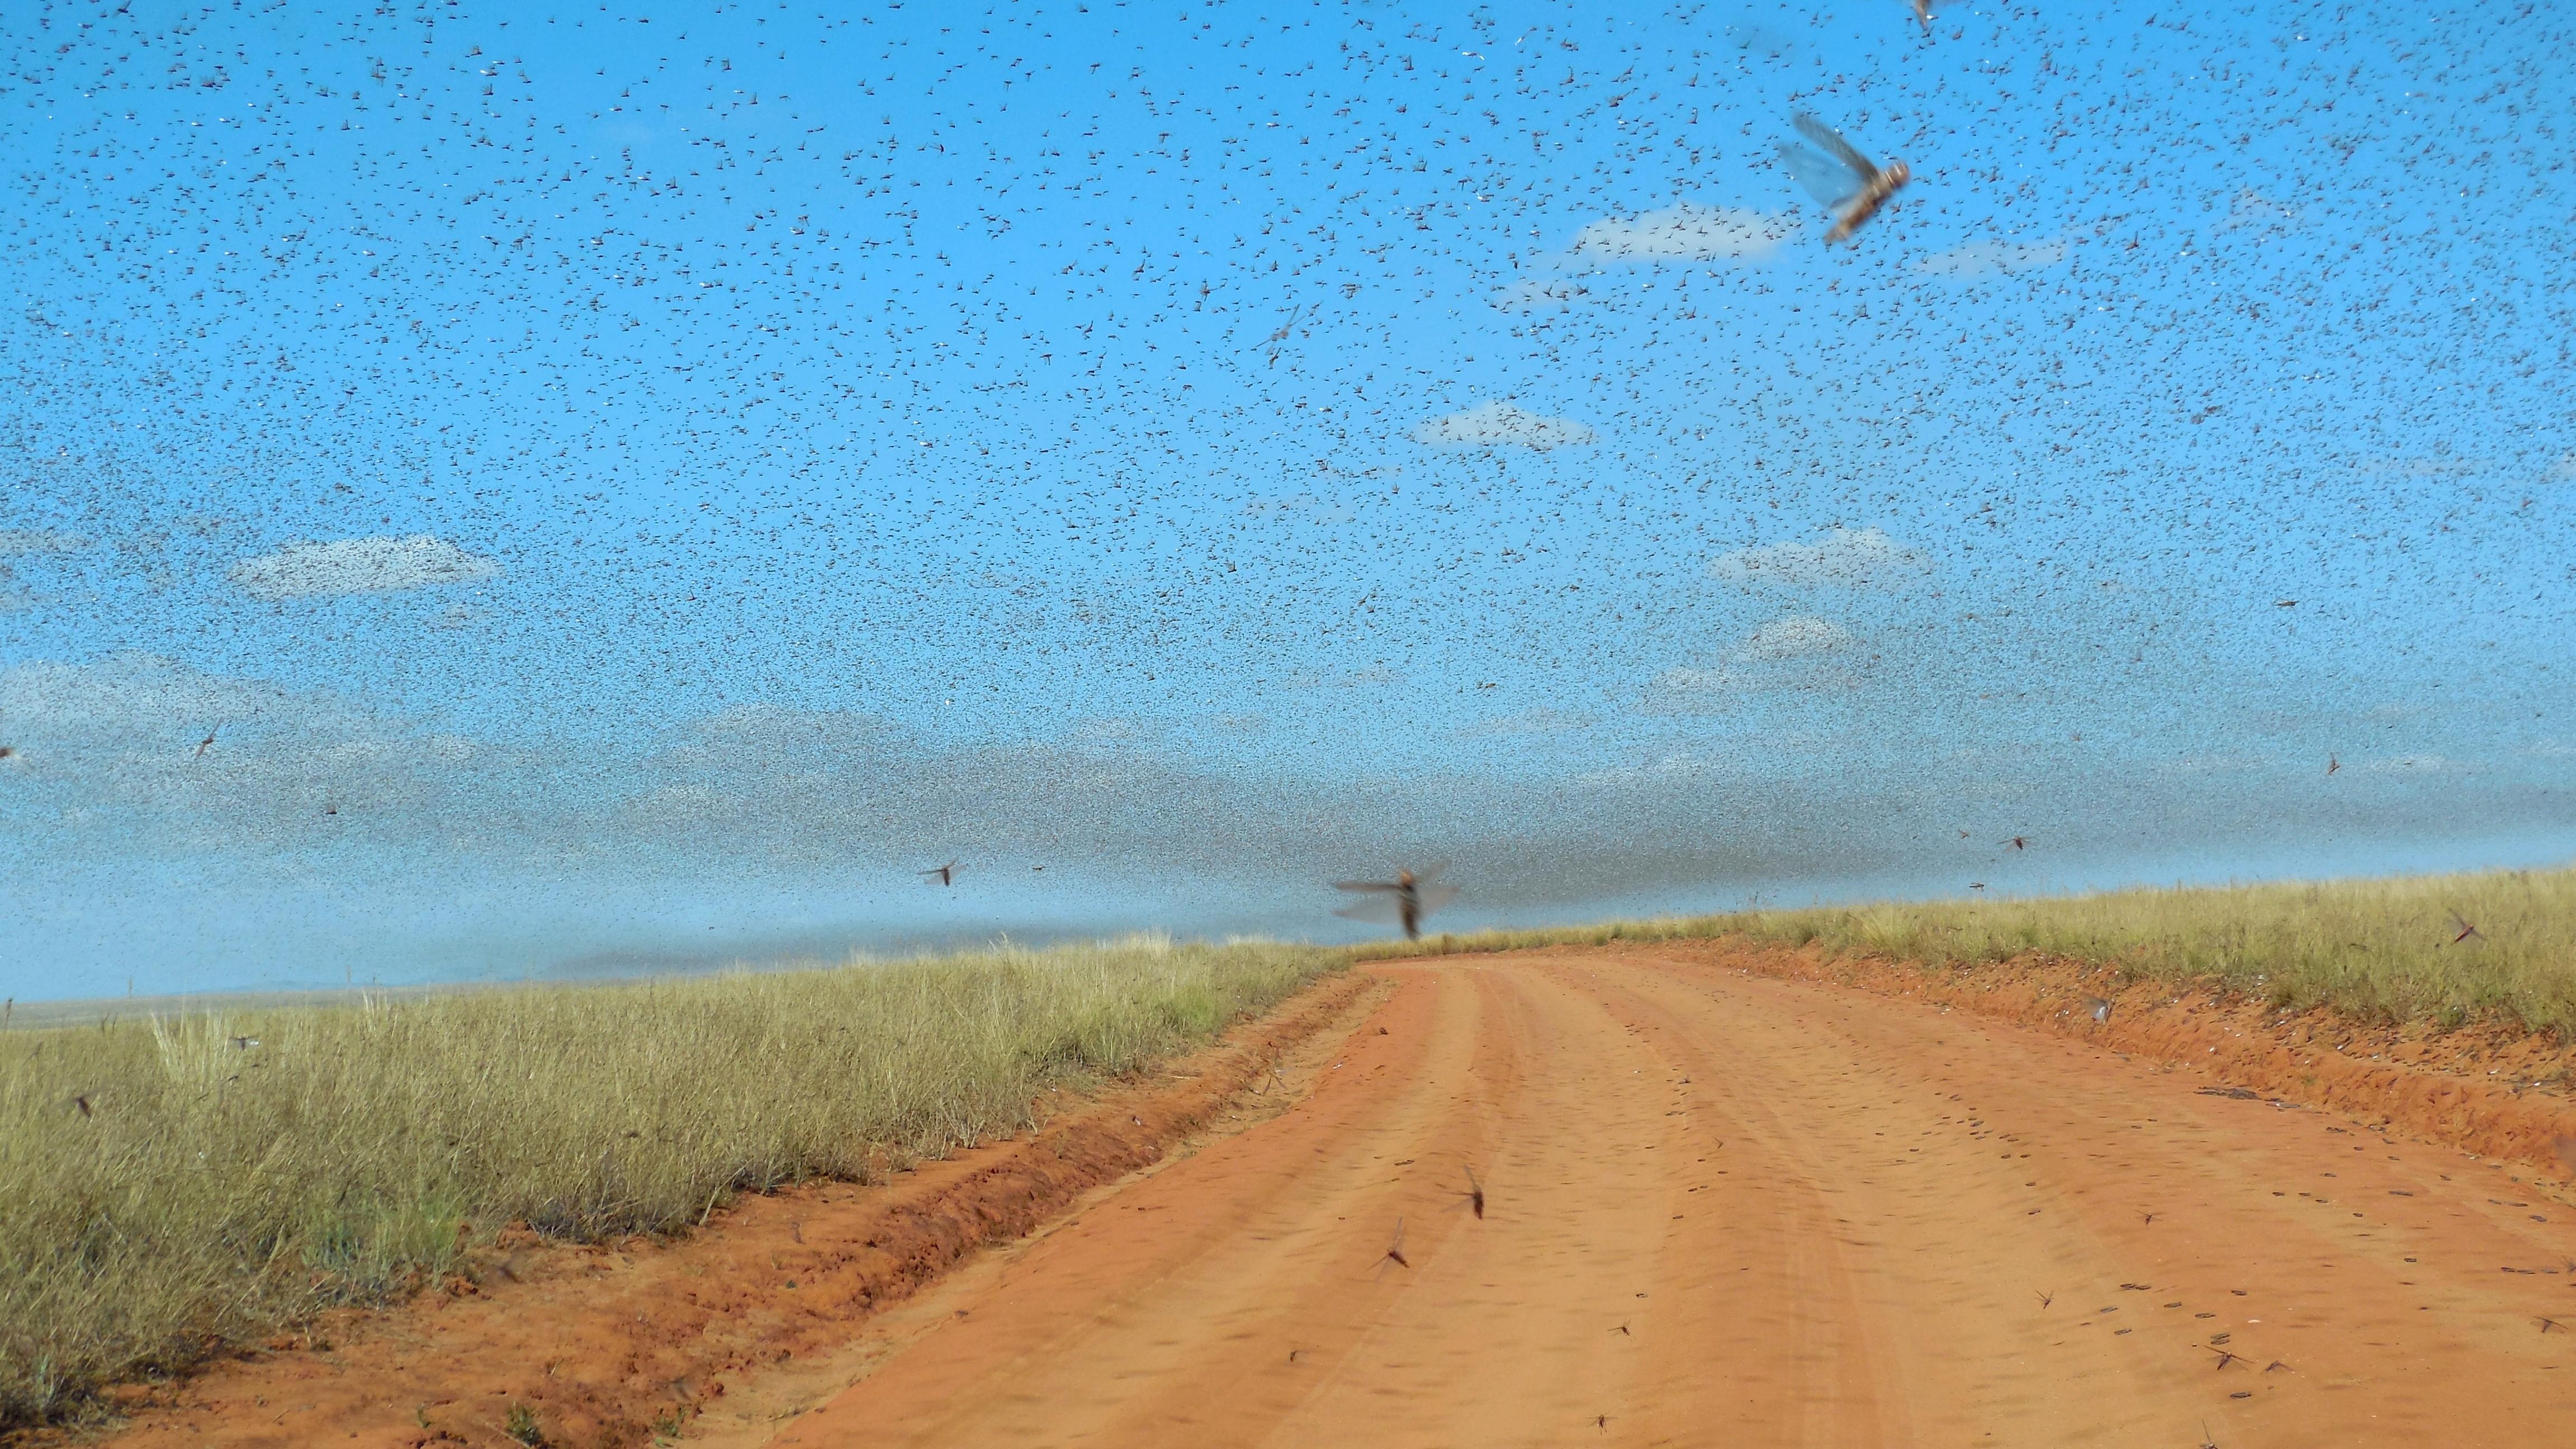 Kenya braces for returning locust swarms